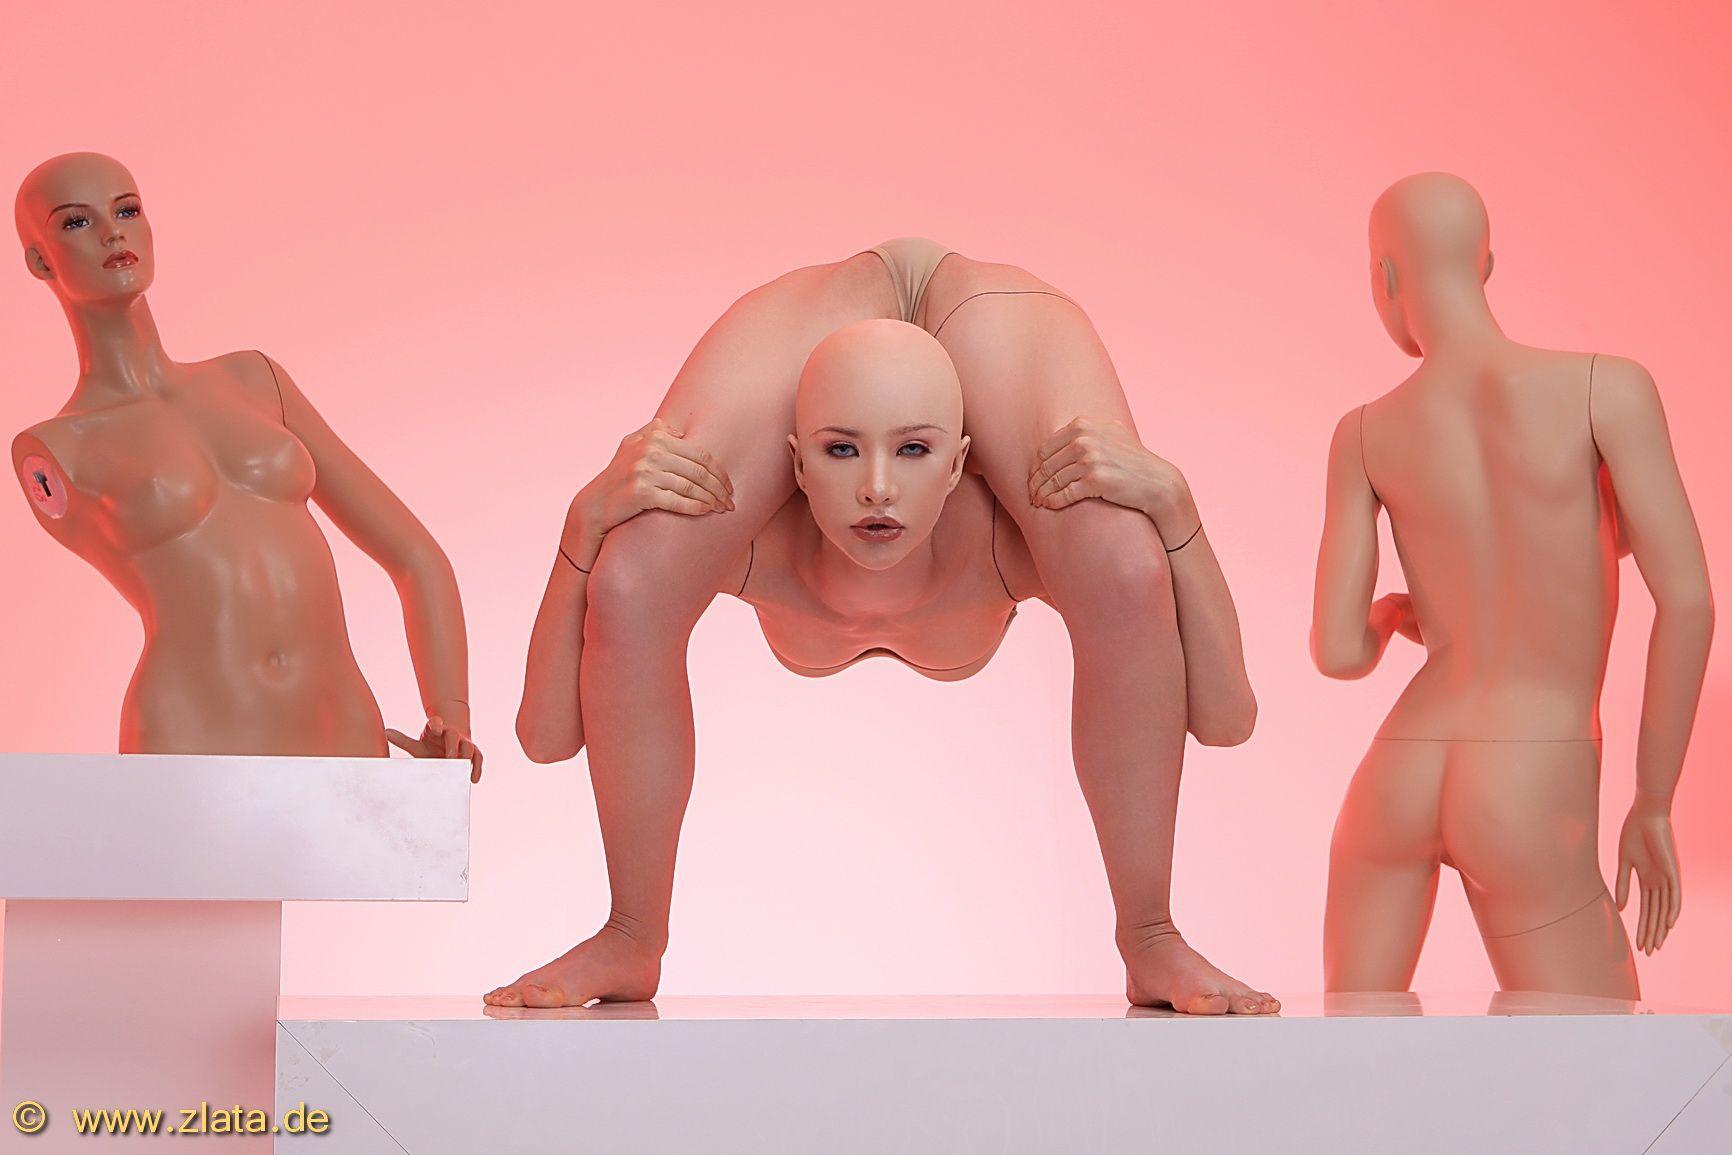 Contortionist Zlata 47 10 057 Flexibility